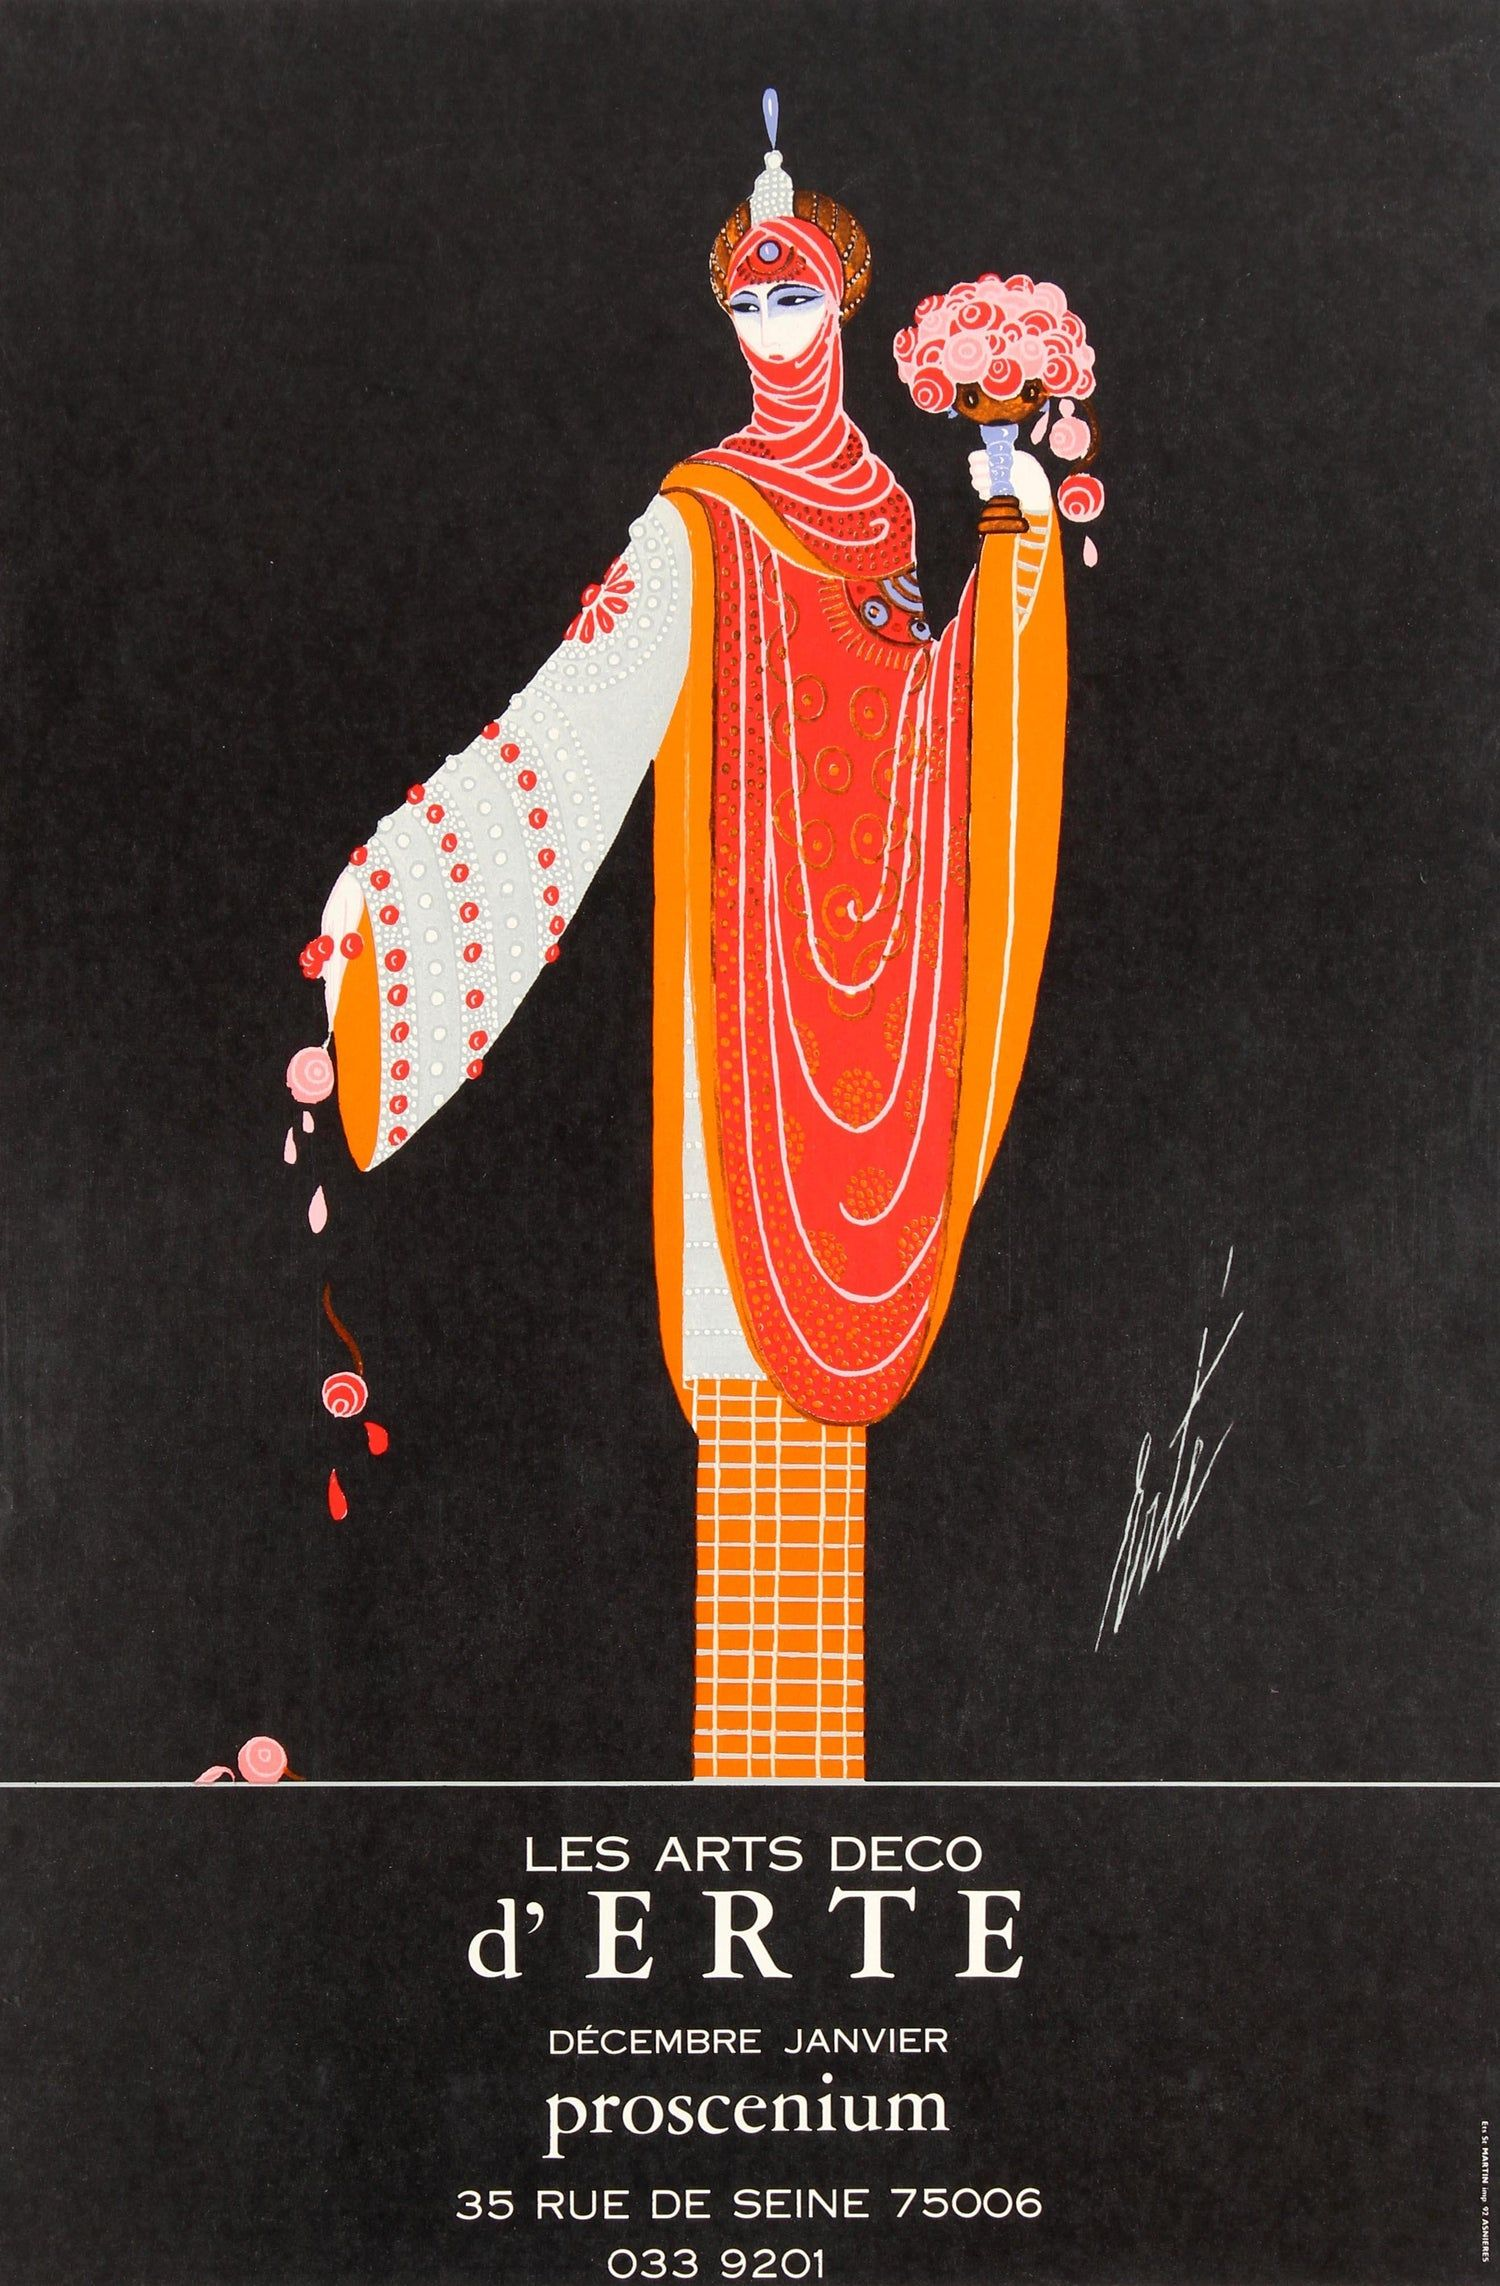 Erte Original Vintage Decorative Art Deco Style Poster For Erte Exhibition Proscenium With Images Vintage Posters Decor Vintage Poster Art Art Deco